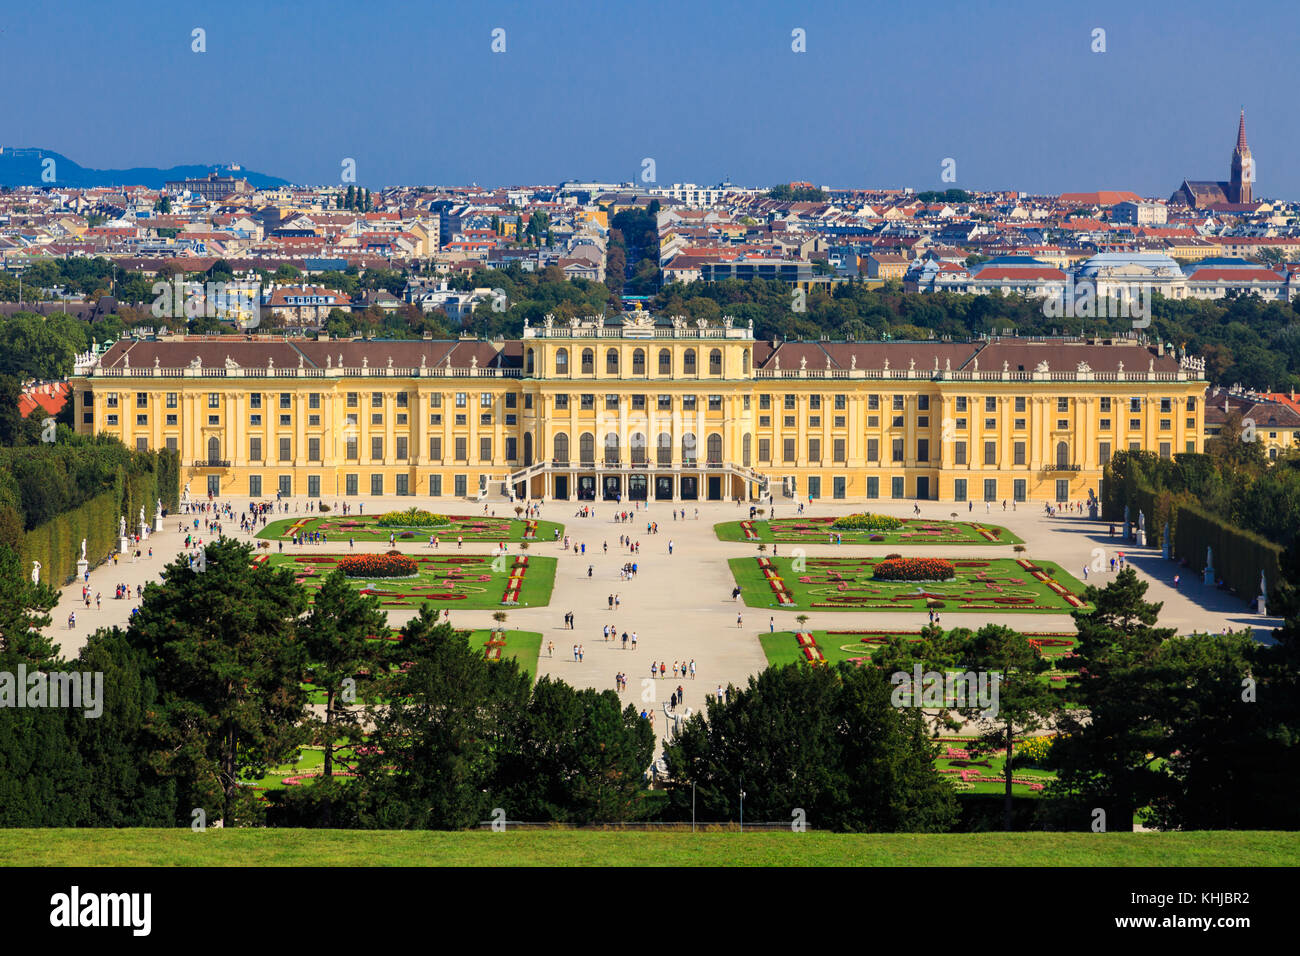 VIENNA, AUSTRIA - SEPTEMBER 11, 2016 : View of Schönbrunn Palace, one of best touristic attractions in Vienna - Stock Image